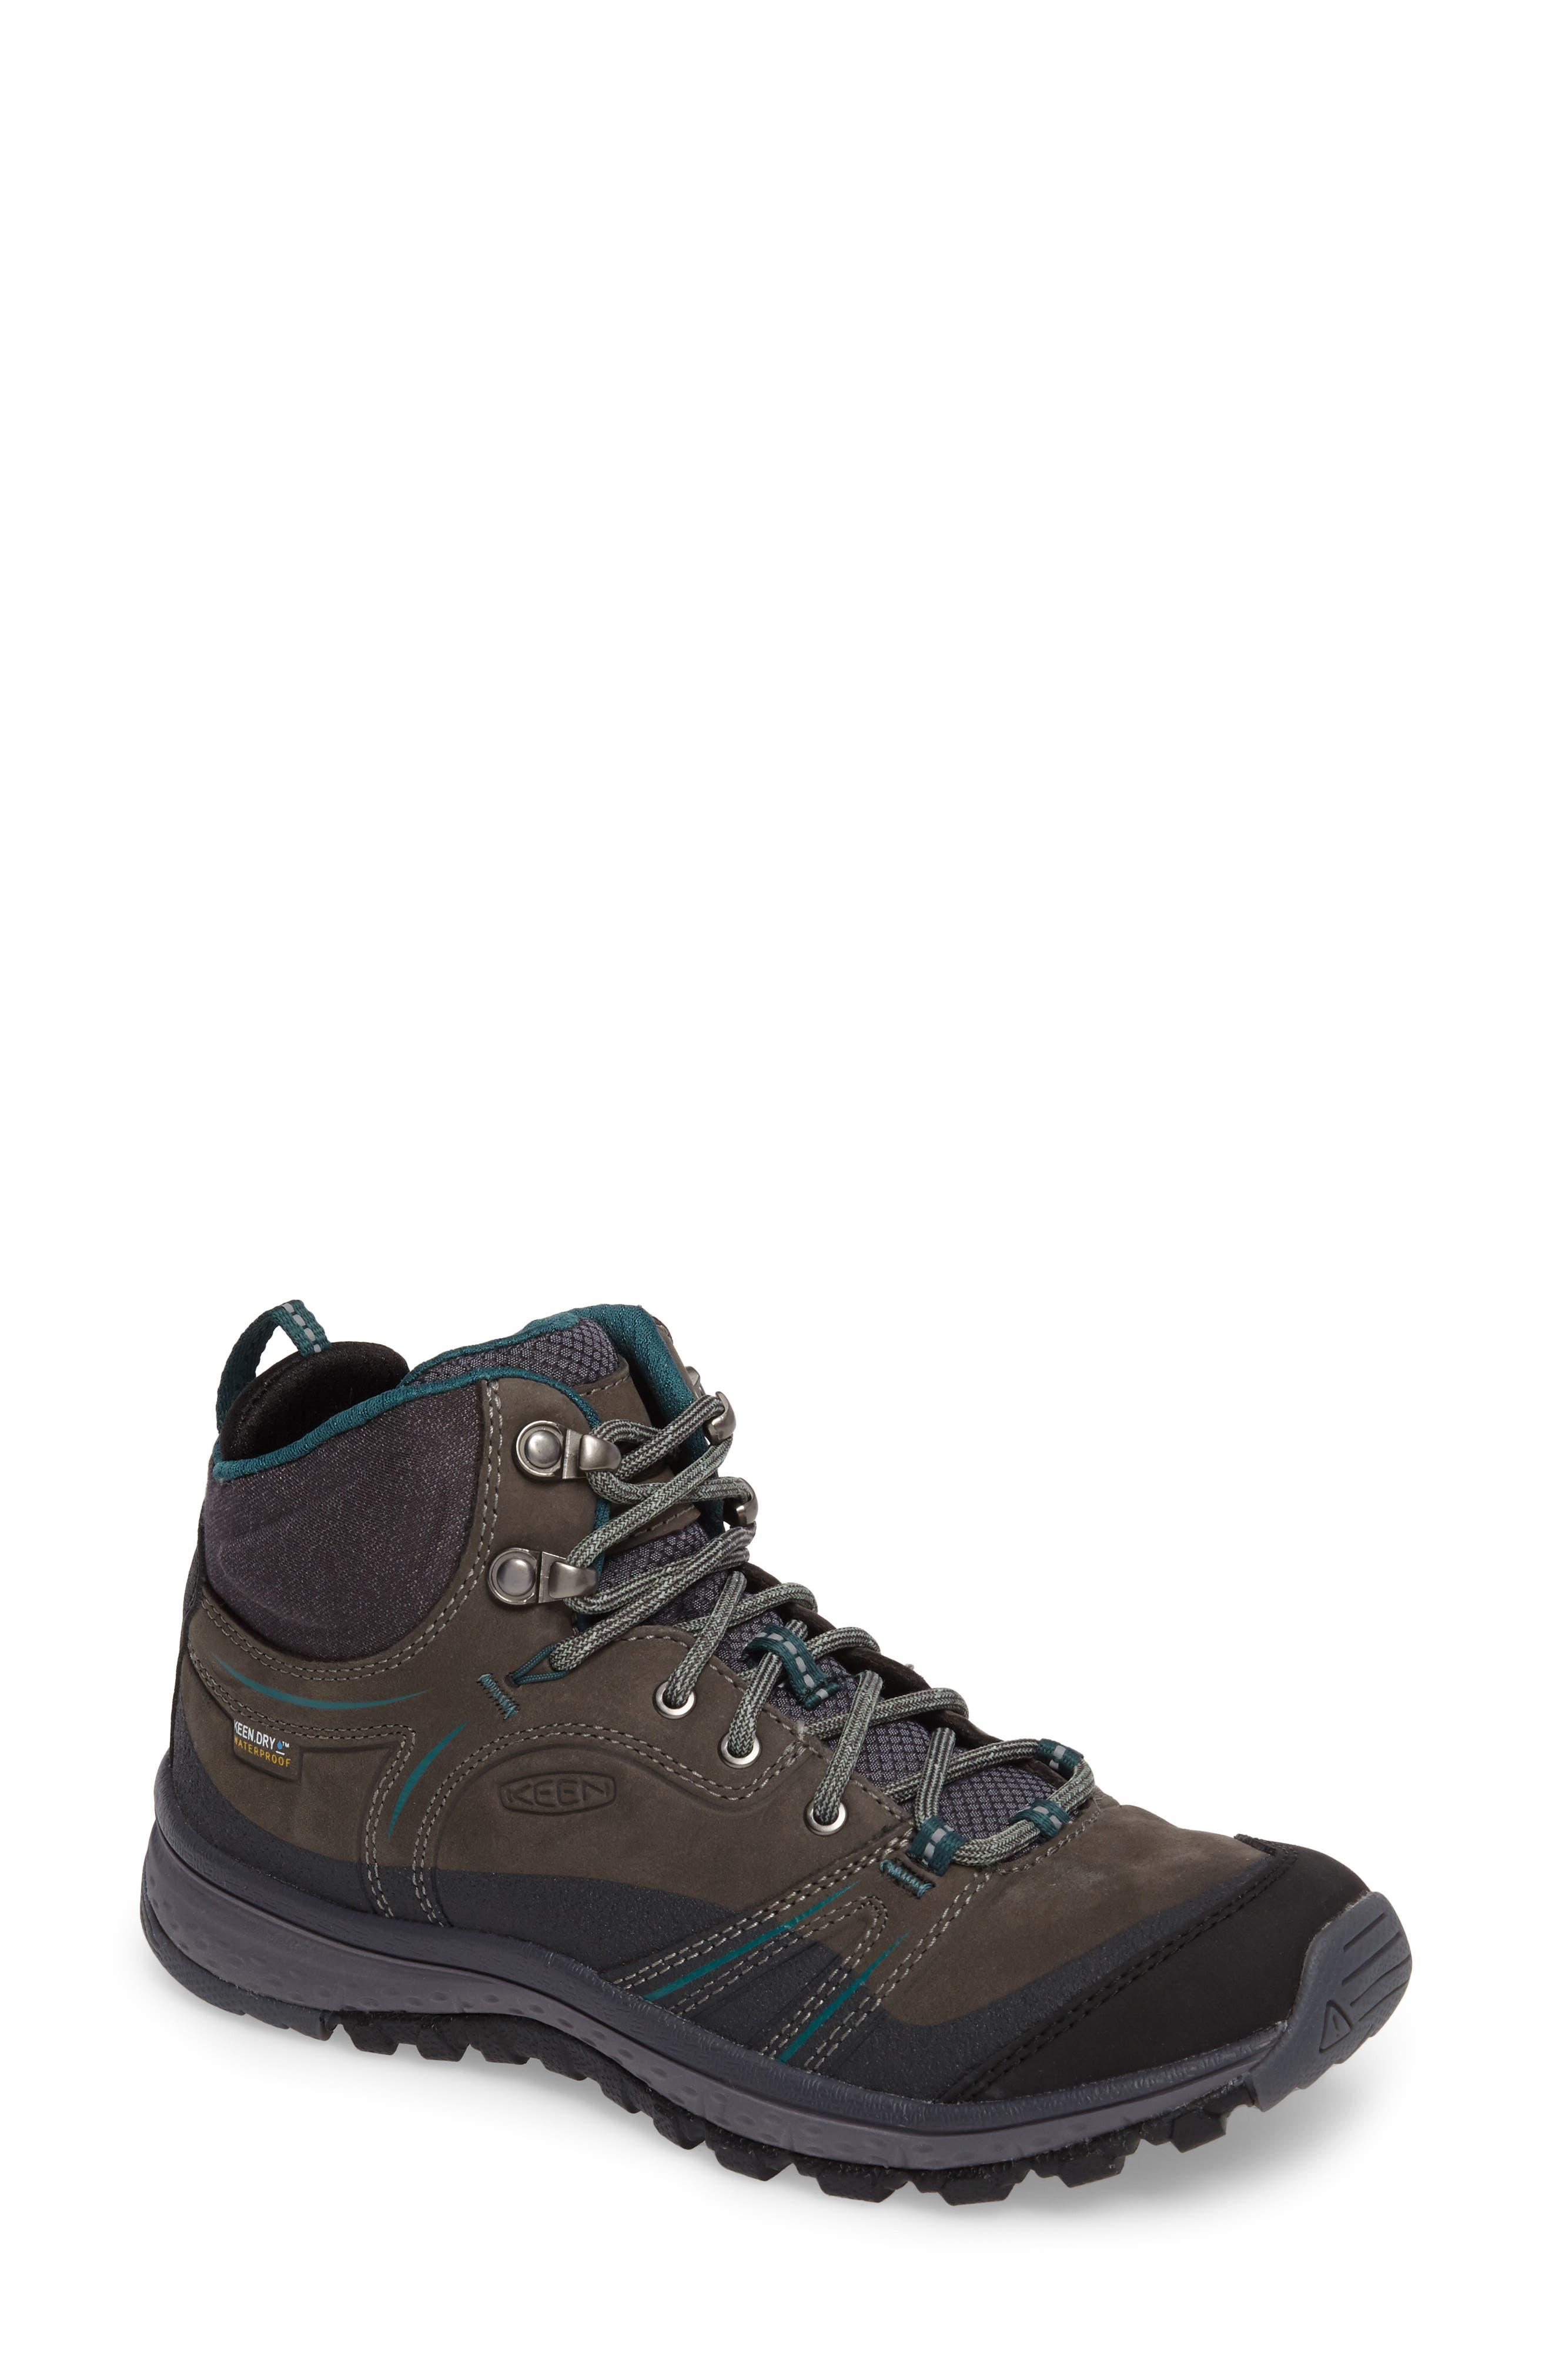 Terradora Leather Waterproof Hiking Boot,                         Main,                         color, MUSHROOM NUBUCK LEATHER